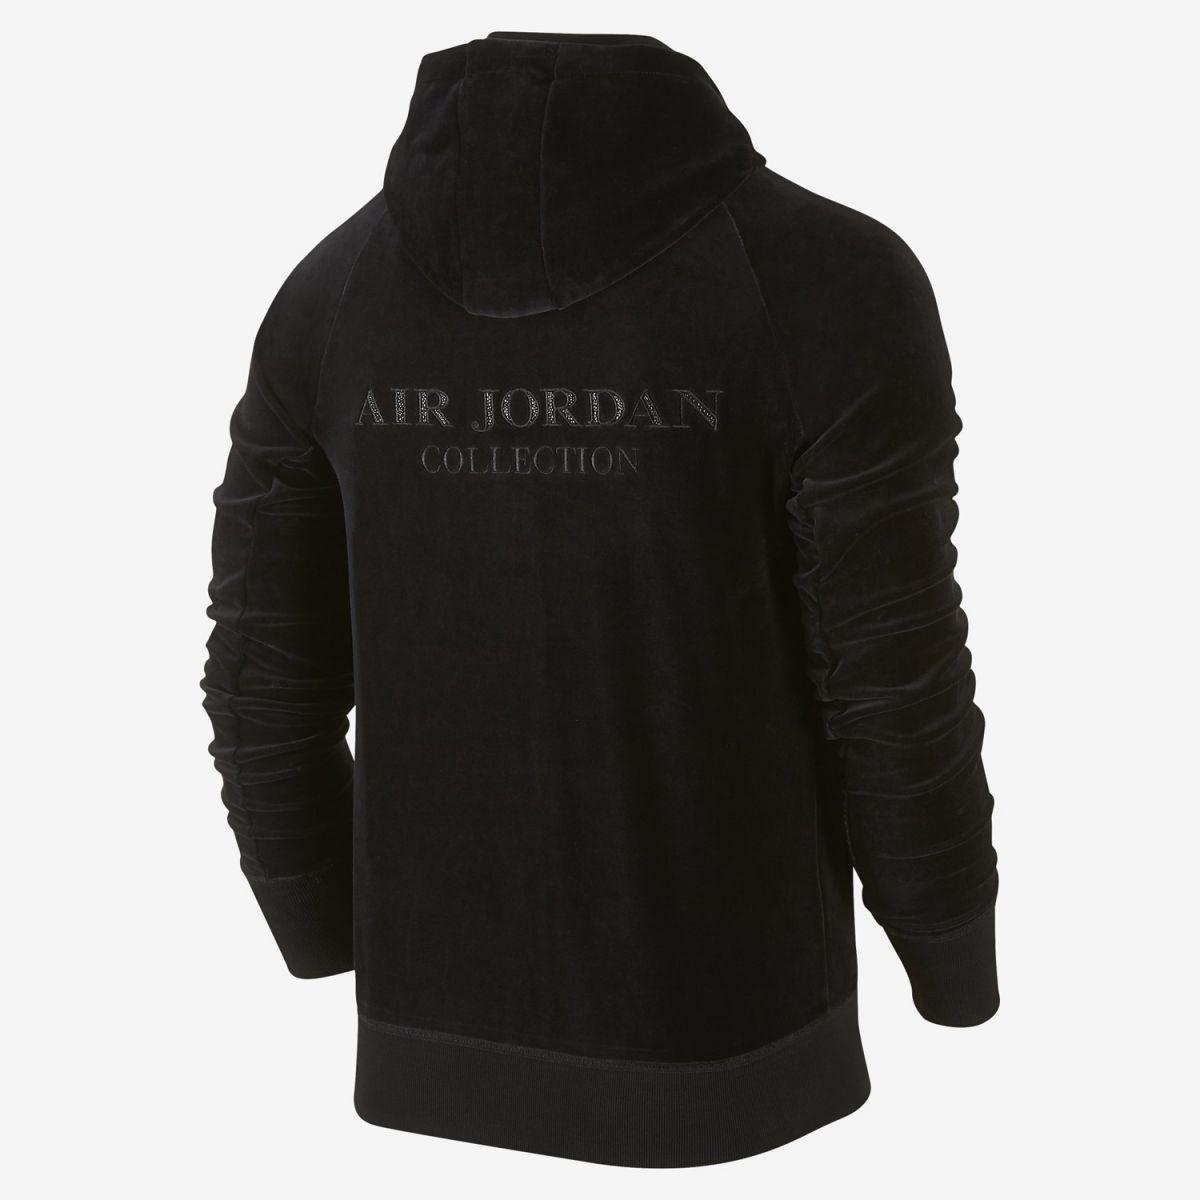 29e833de1568 Jordan Brand Unveils the Black OVO Collection